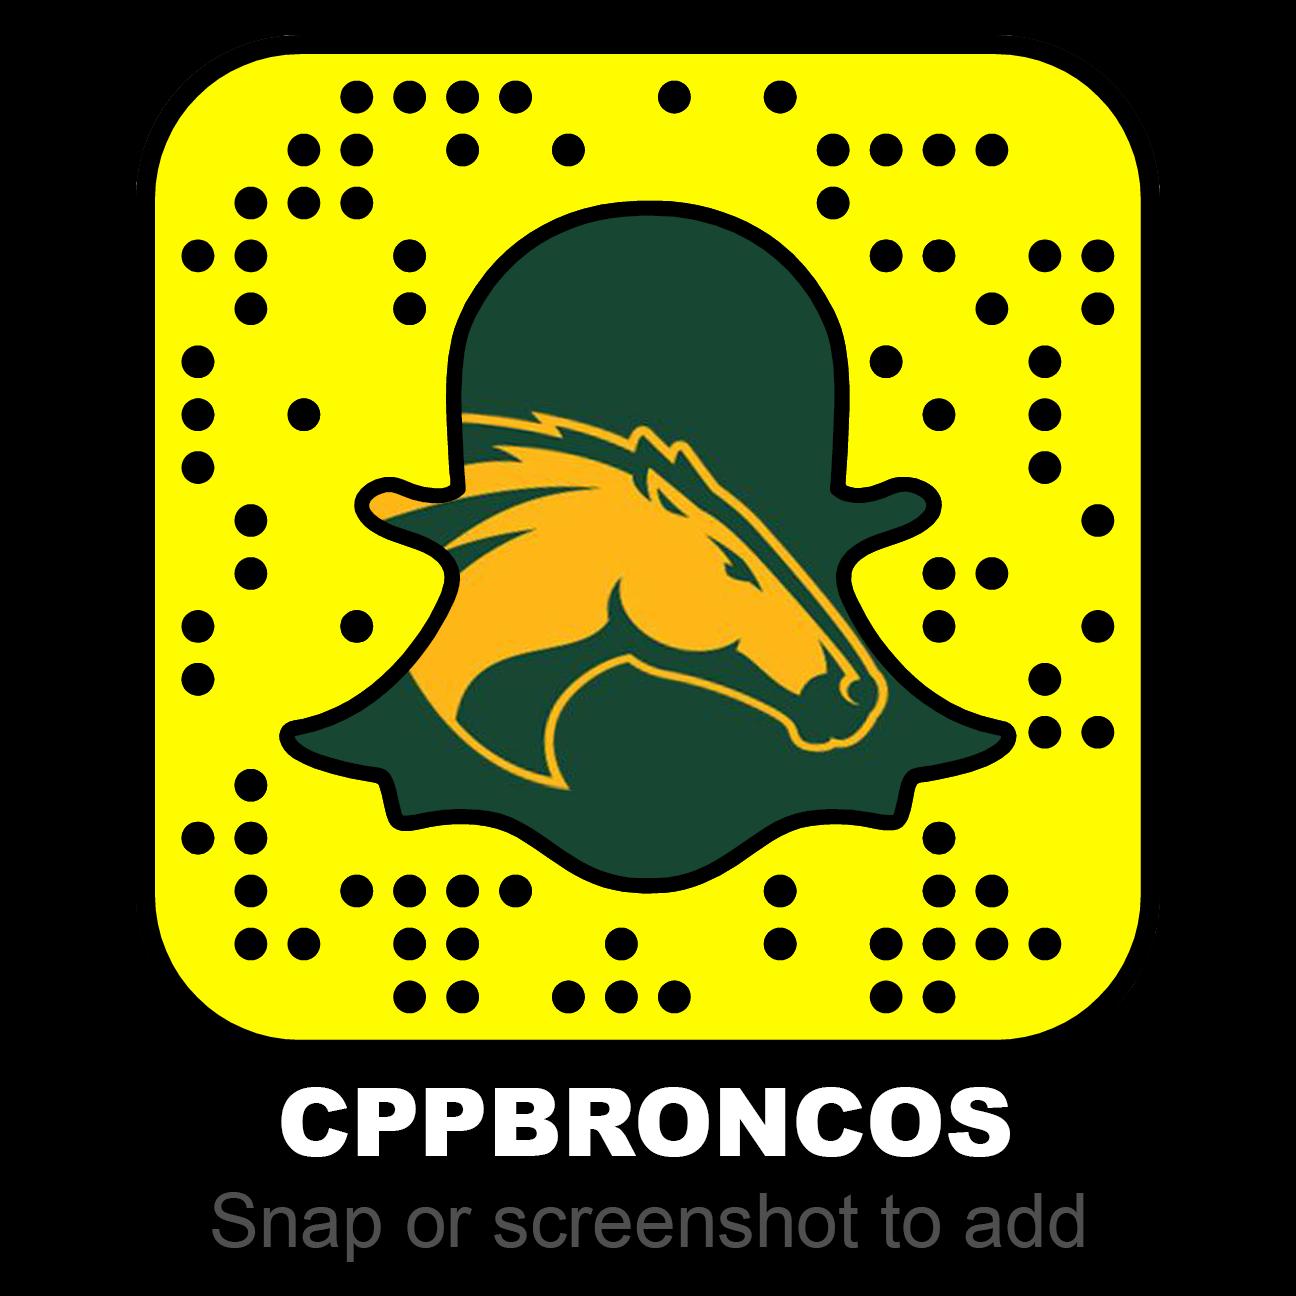 Athletics - Snapchat Account